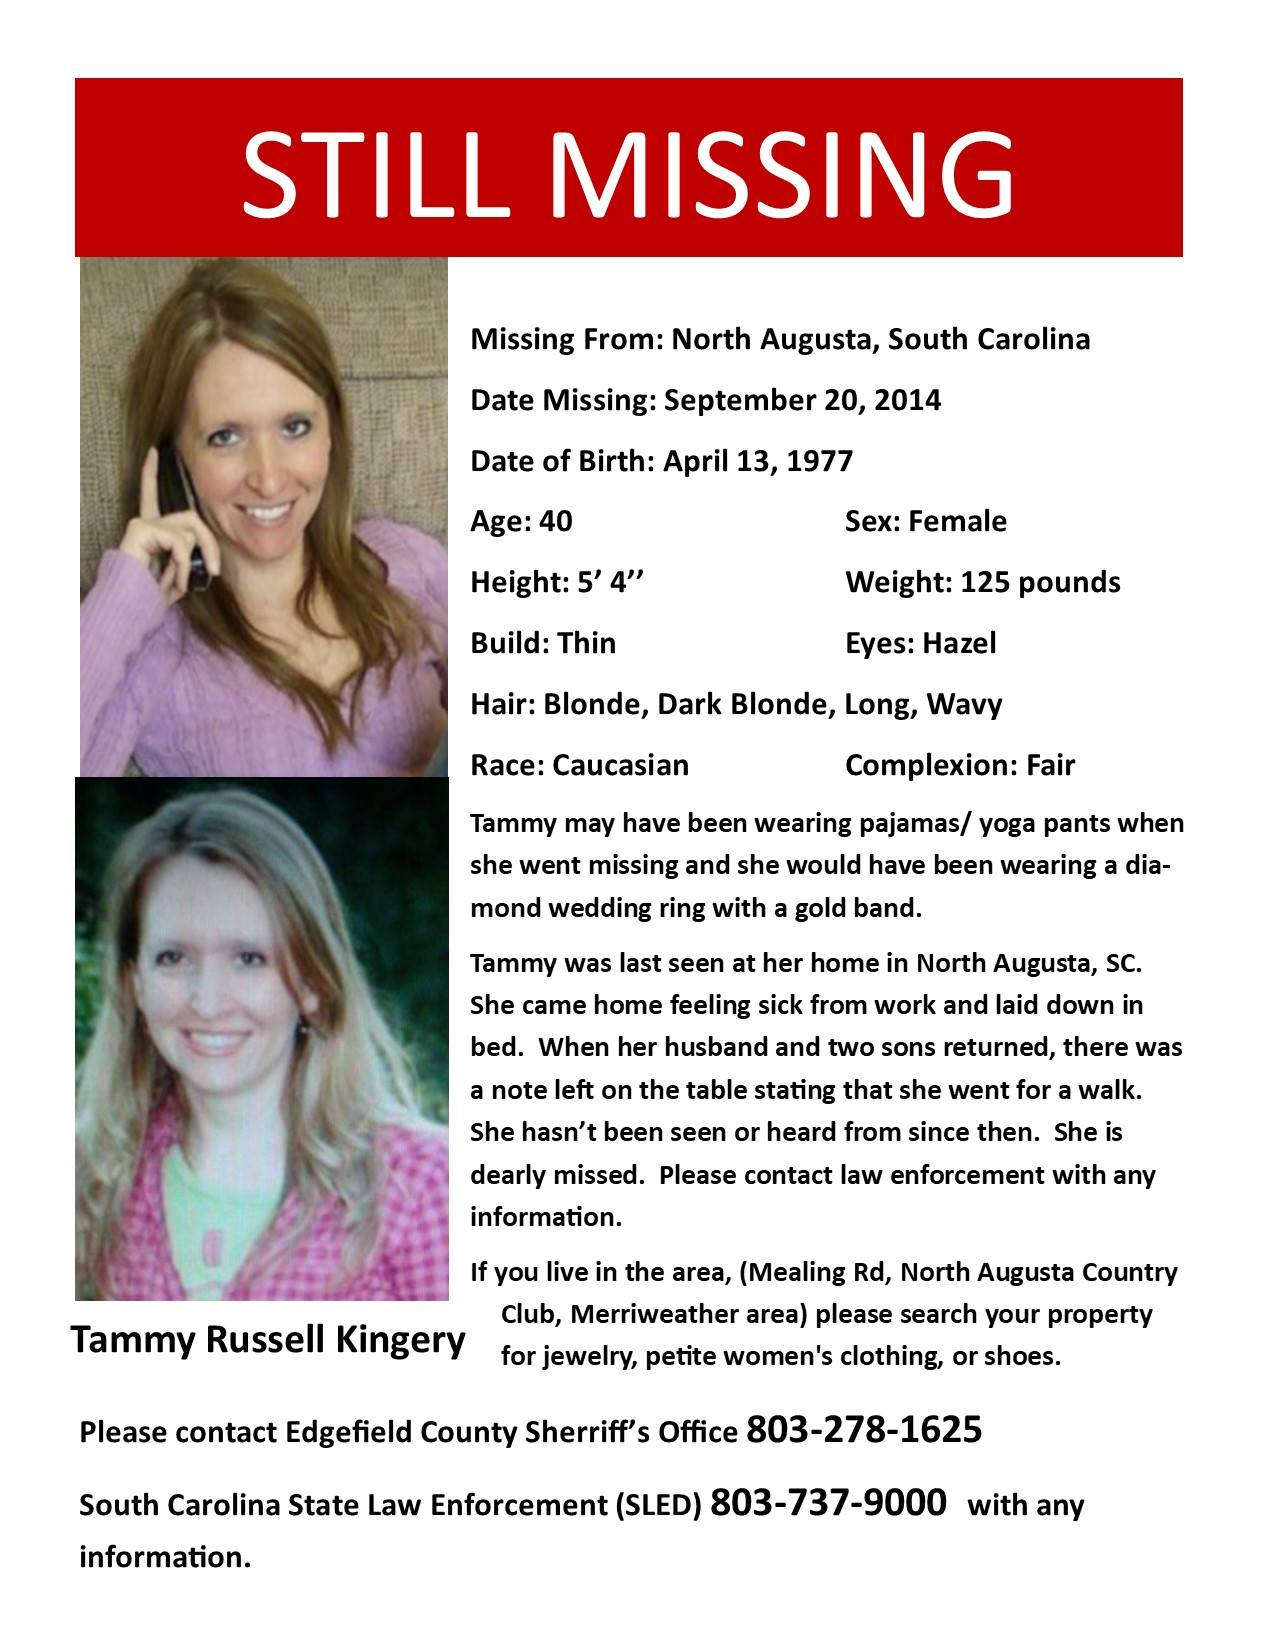 Tammy Kingery Missing 2014